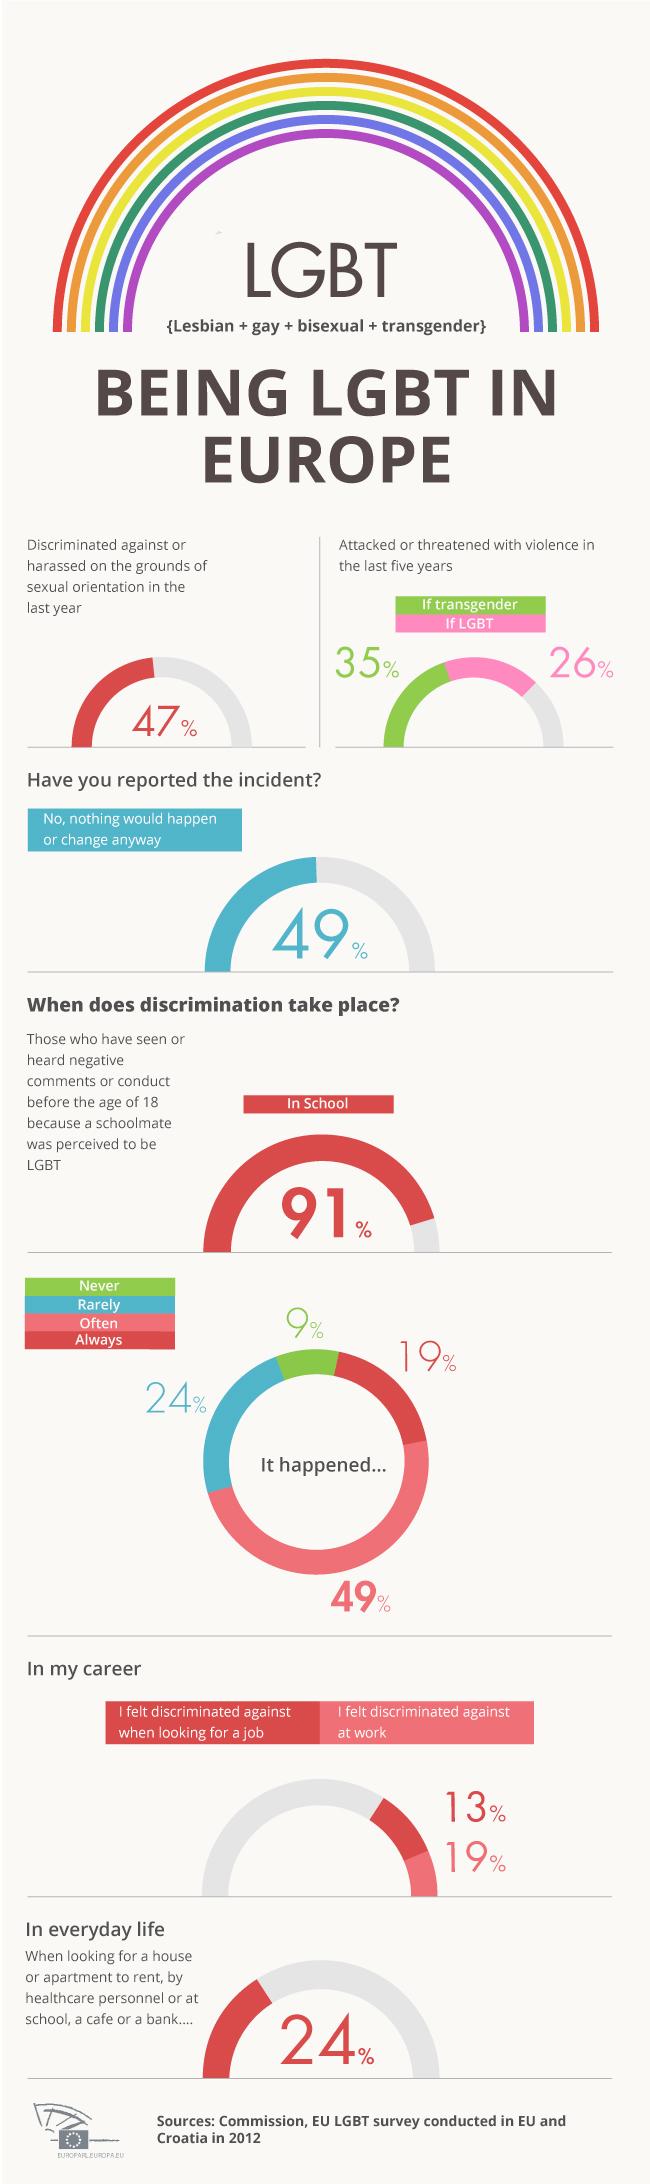 2013-05-17-infographic.jpg